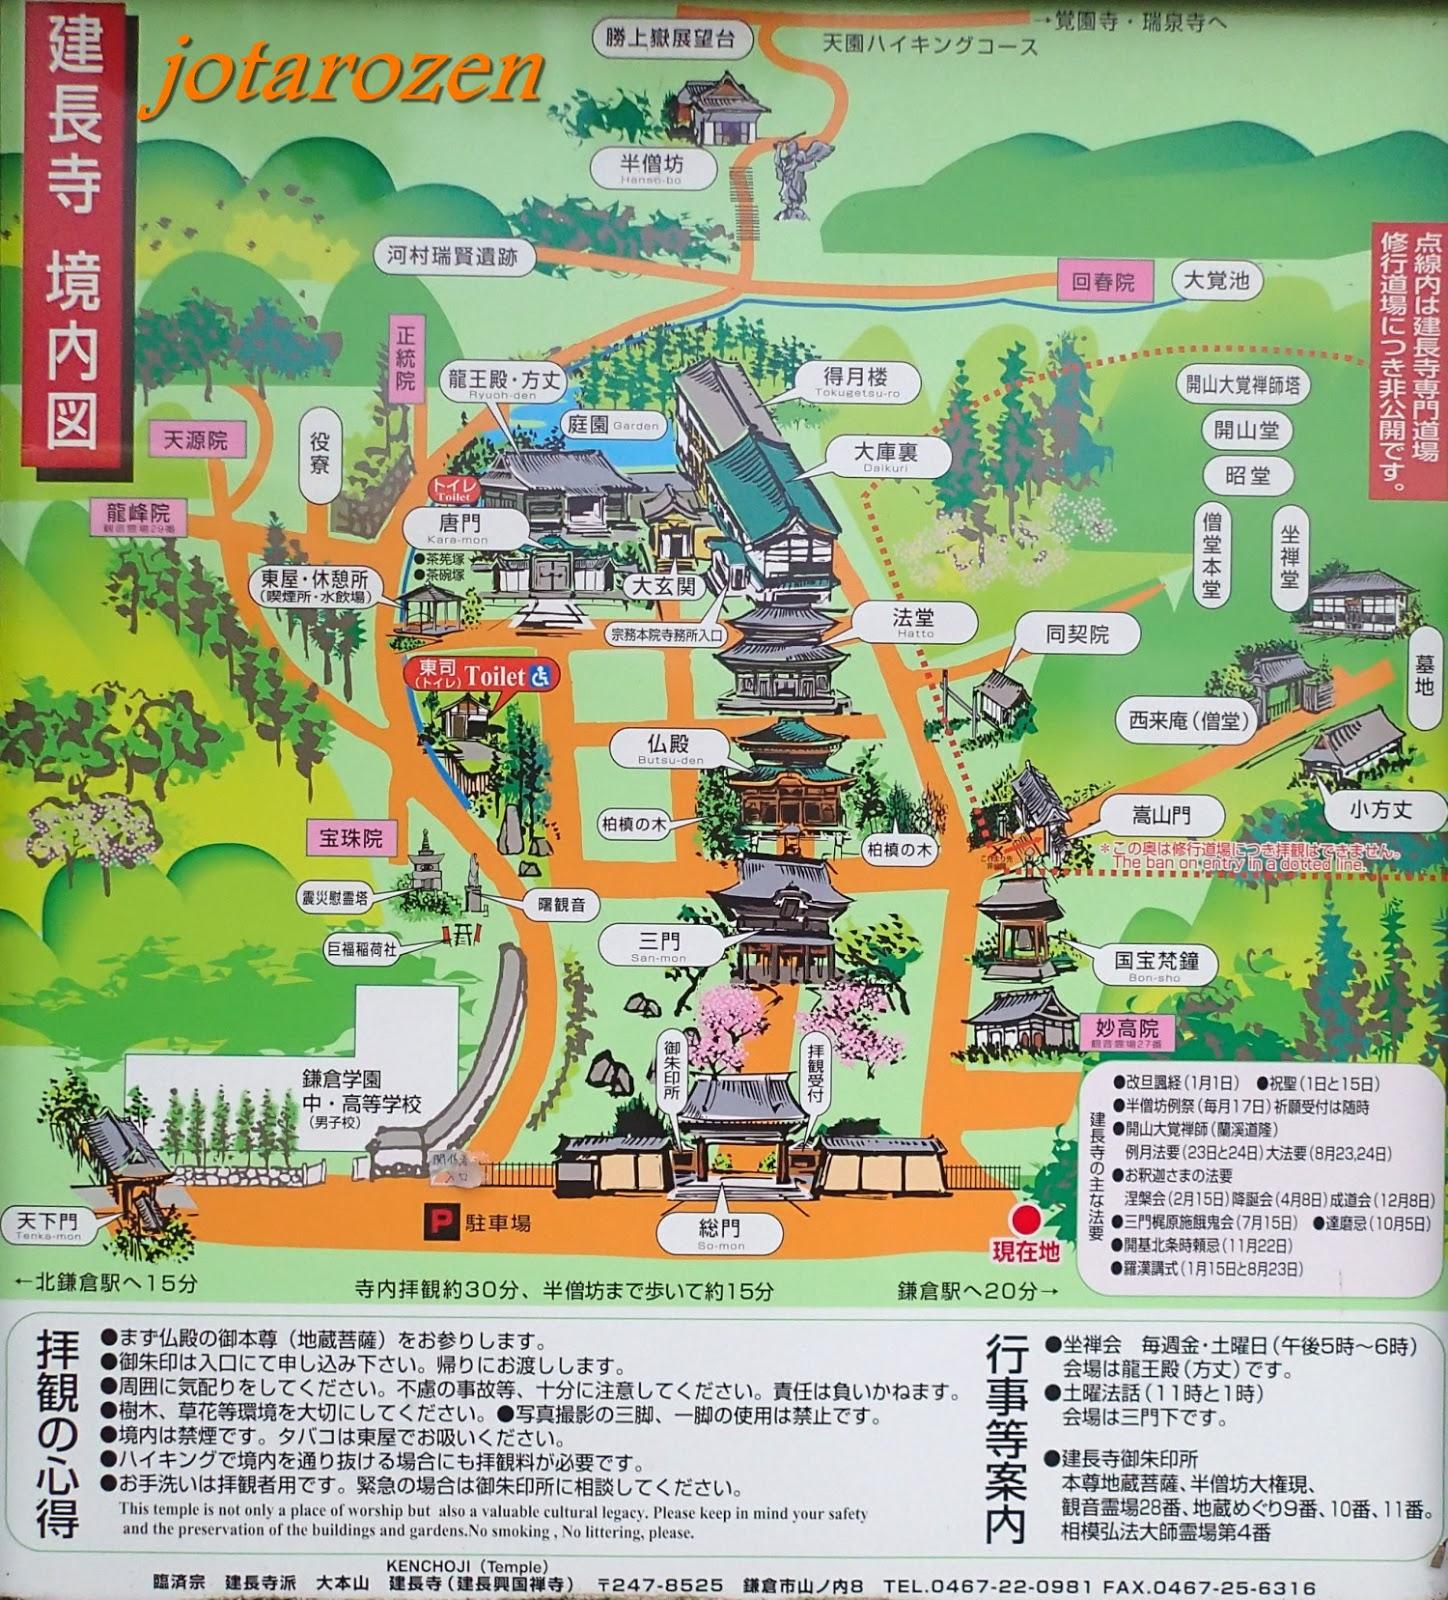 Footsteps Jotaros Travels Travel Tips JapanTokyo Kamakura